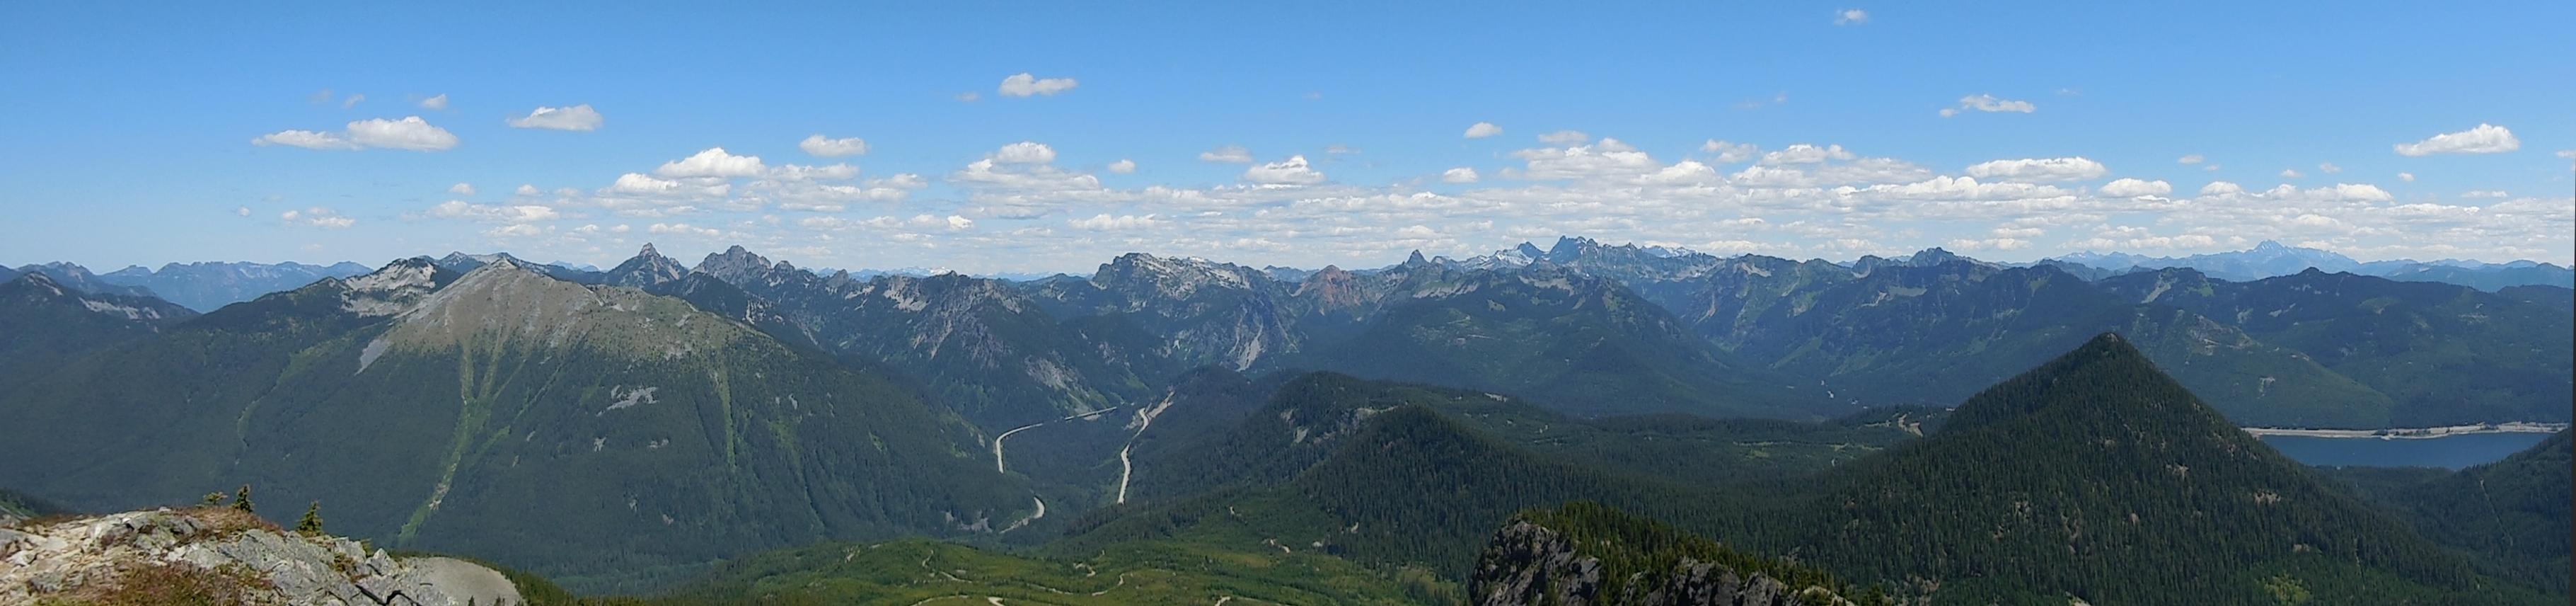 panorama from summit f silver peak